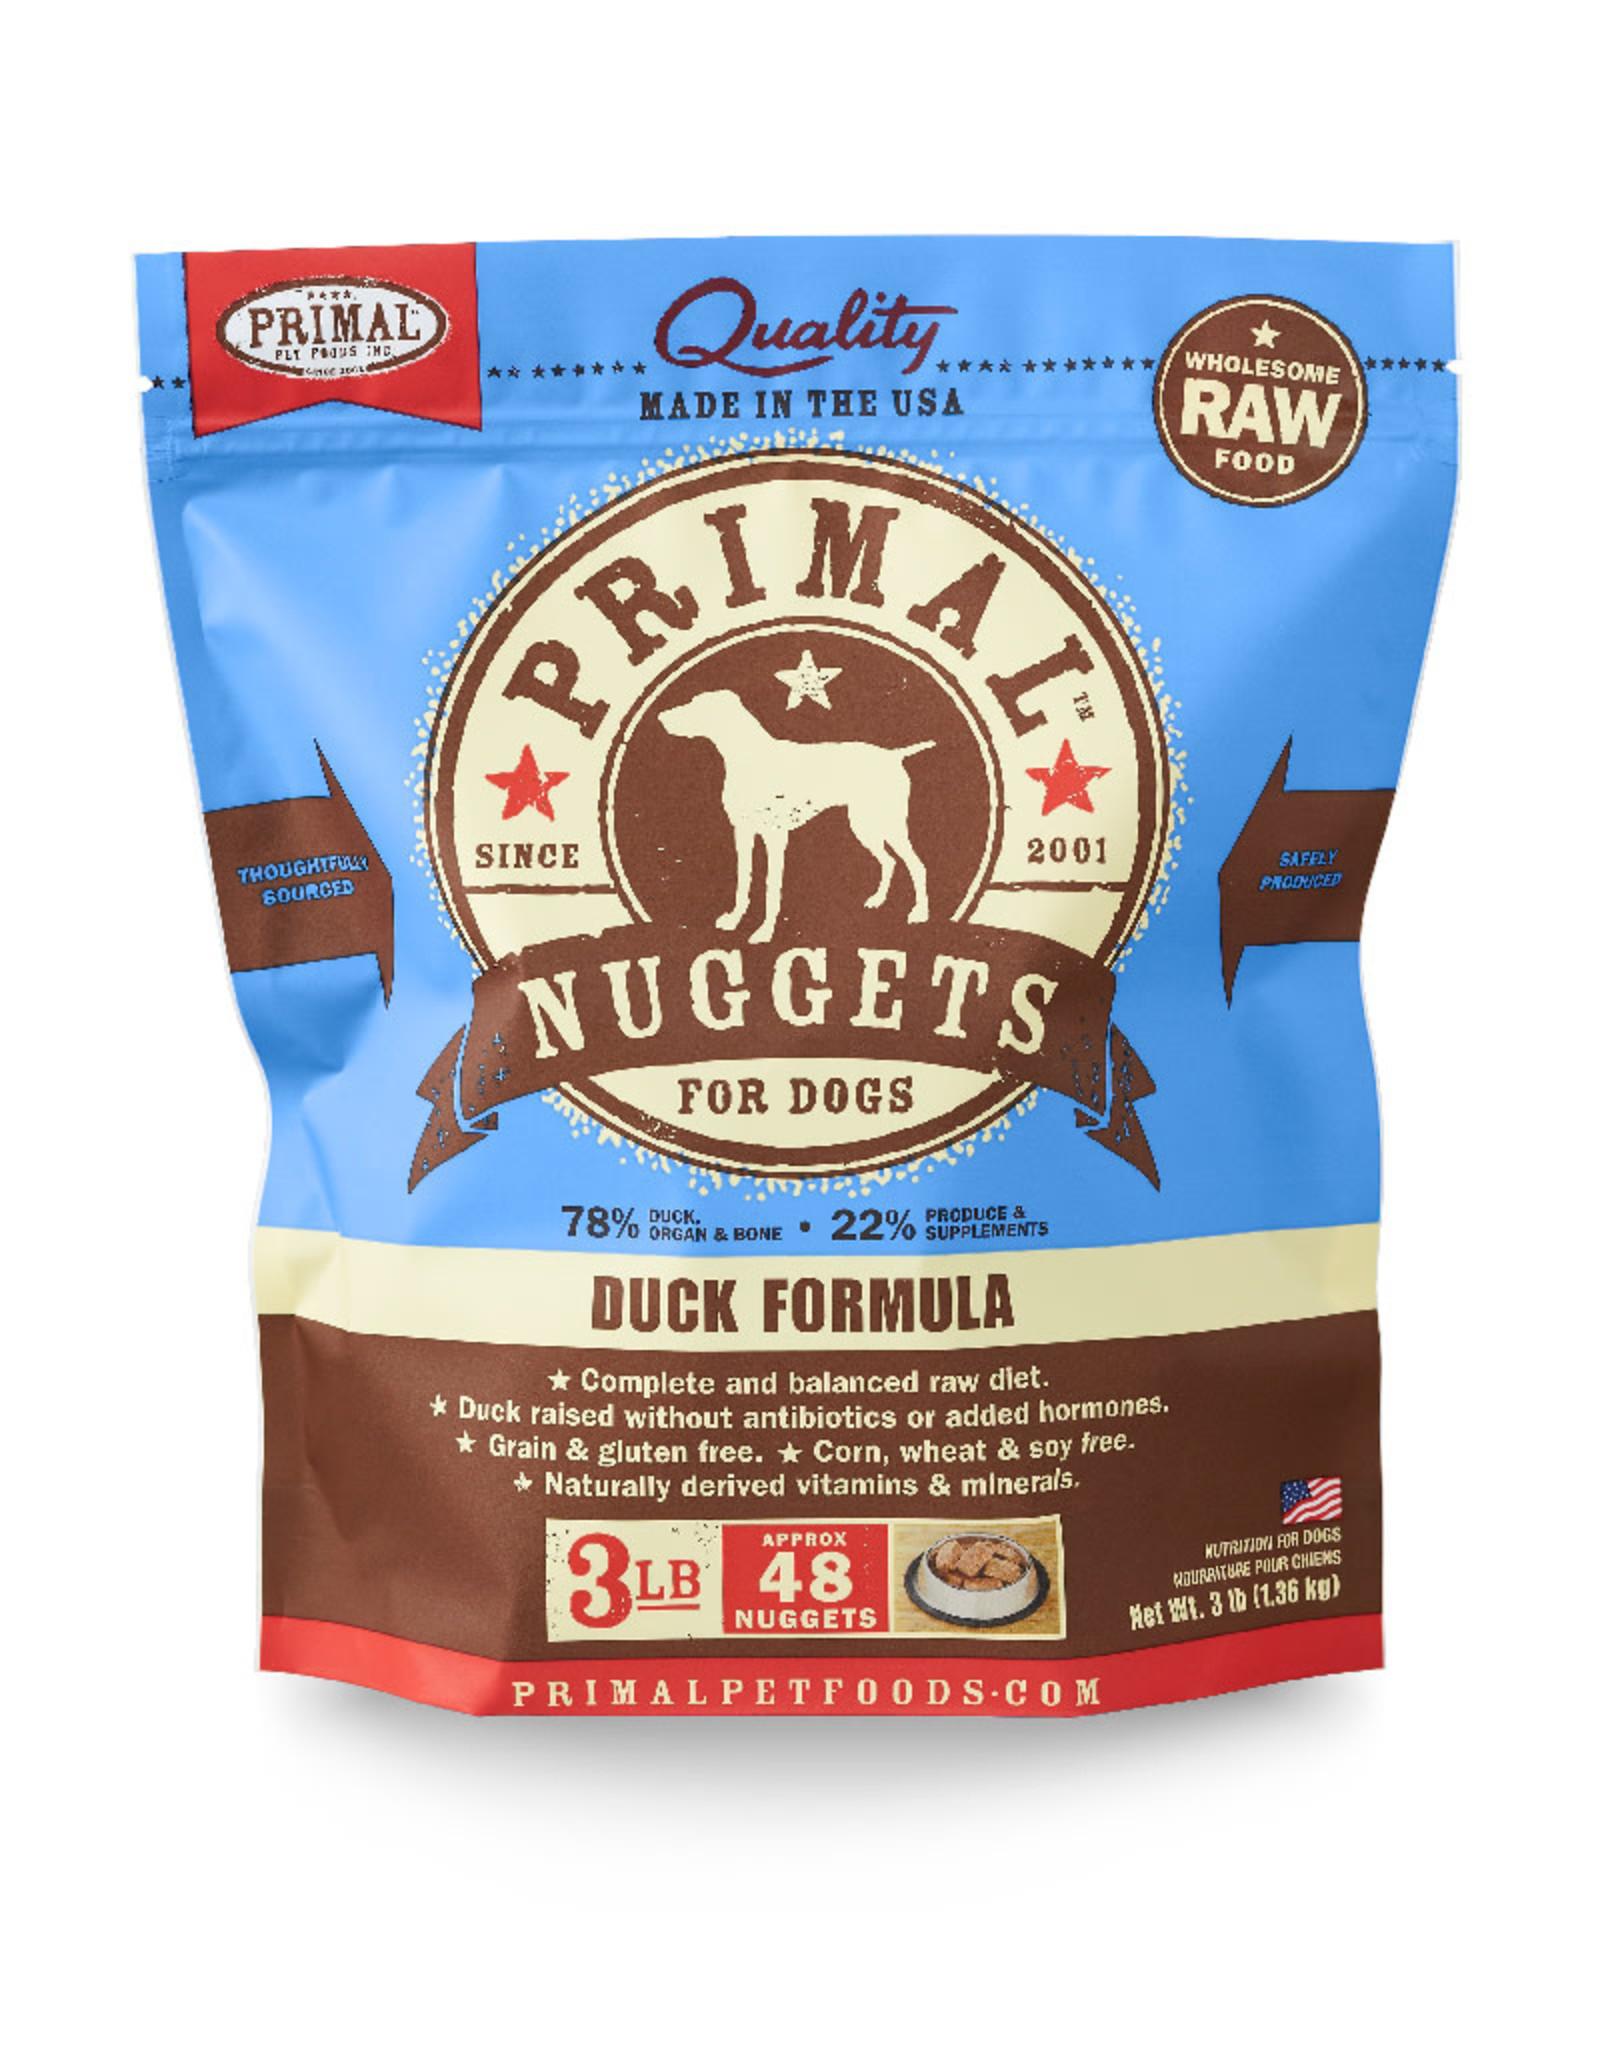 PRIMAL PET FOODS Primal | Raw Frozen Canine Duck Formula